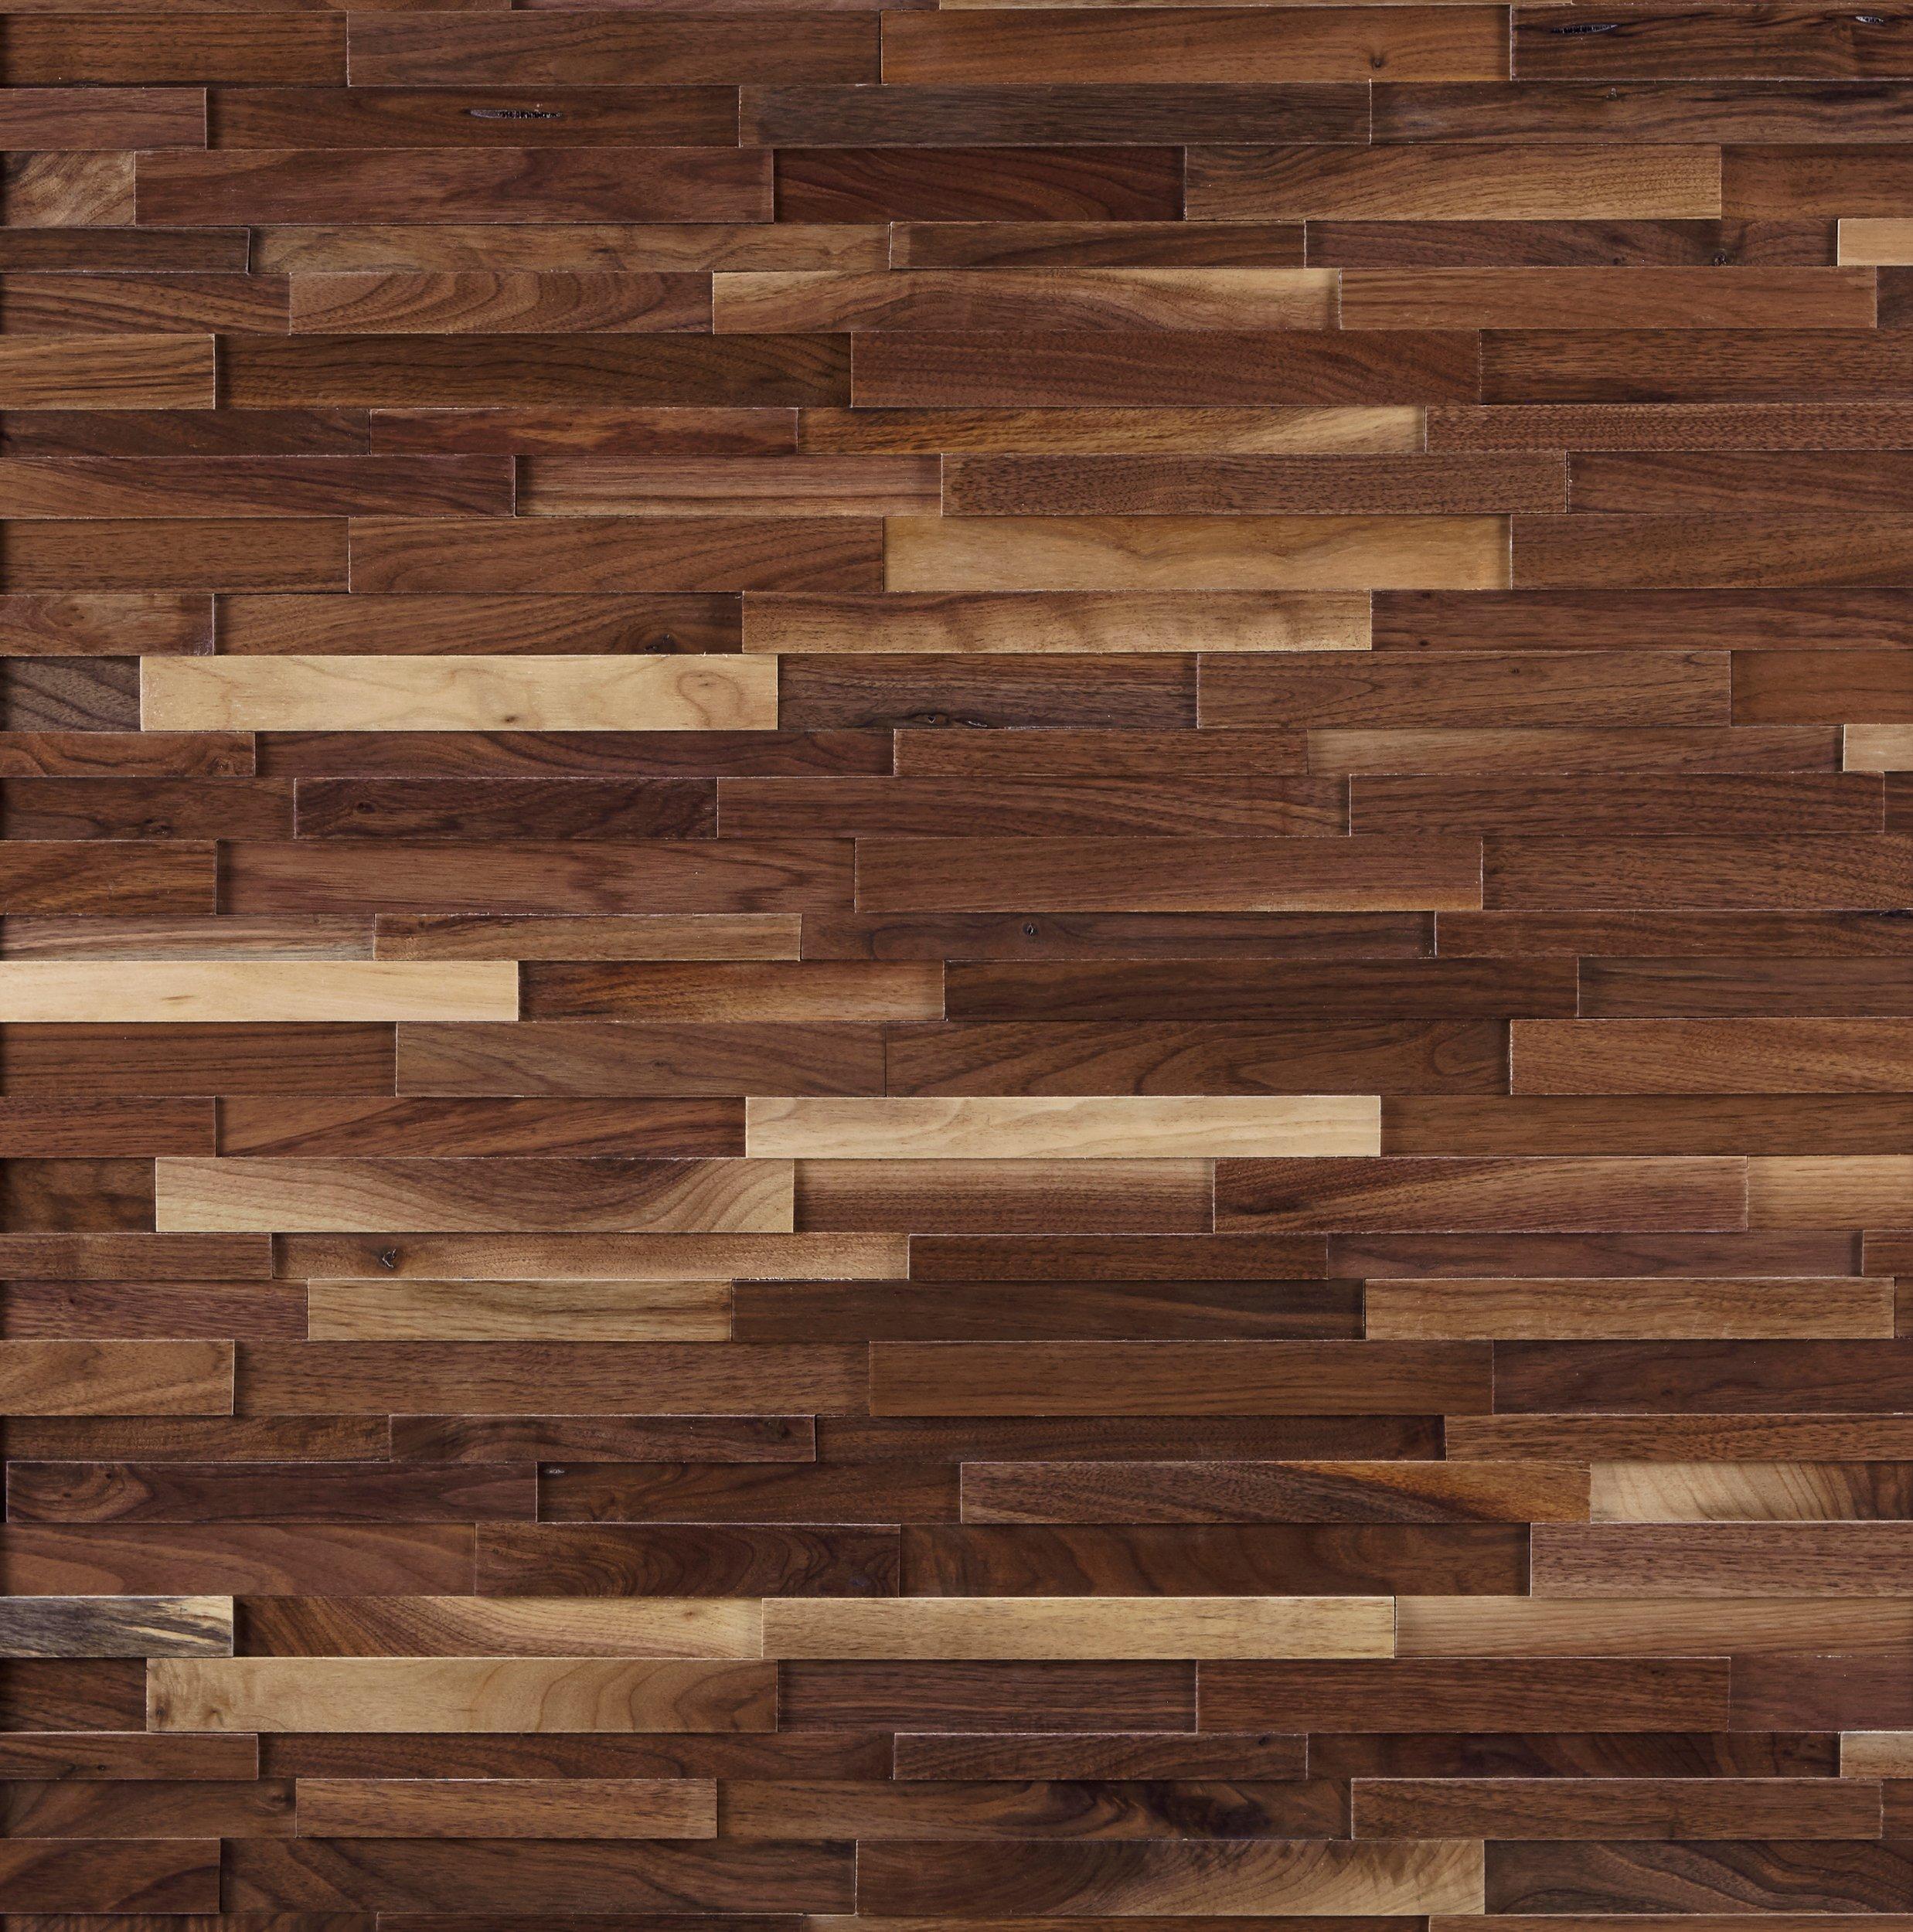 Black Walnut Hardwood Wall Plank Panel 1 2 X 9 4 5 100224153 Floor And Decor